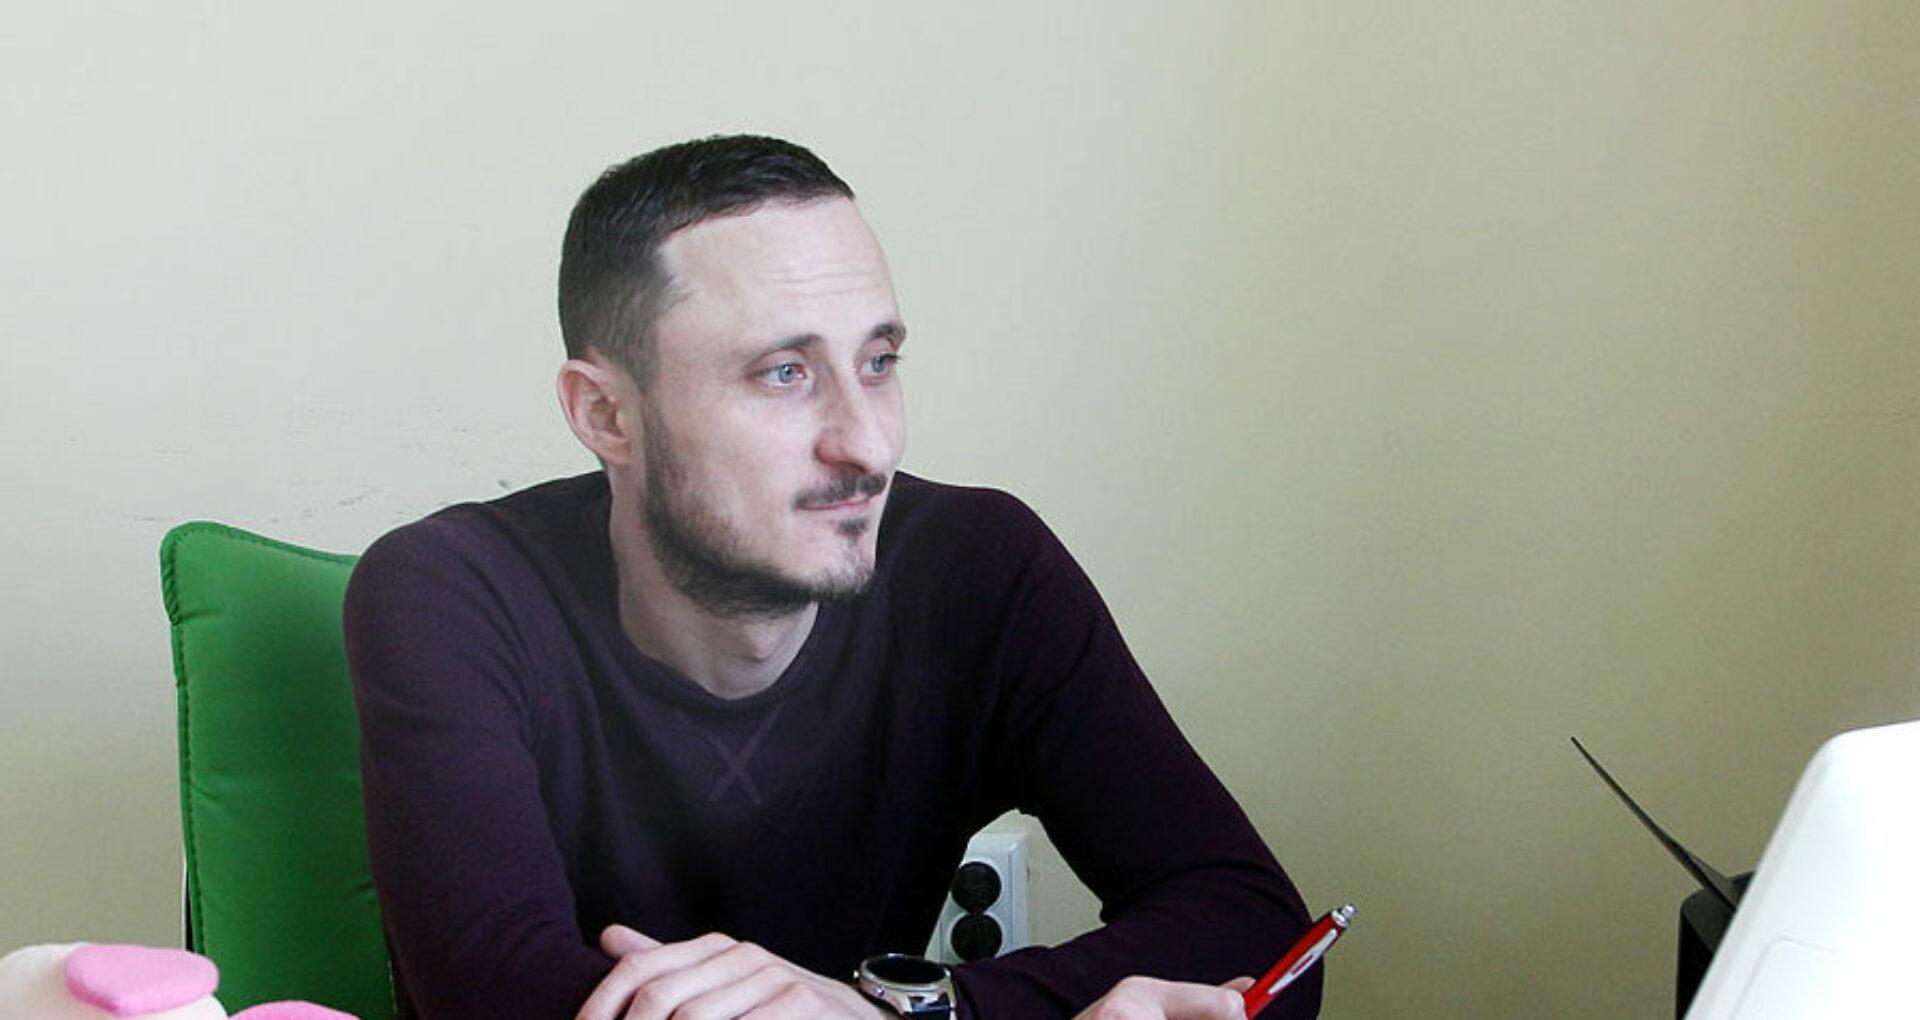 Precizările medicului Mihai Stratulat despre apartenența sa la Partidul Democrat din Moldova